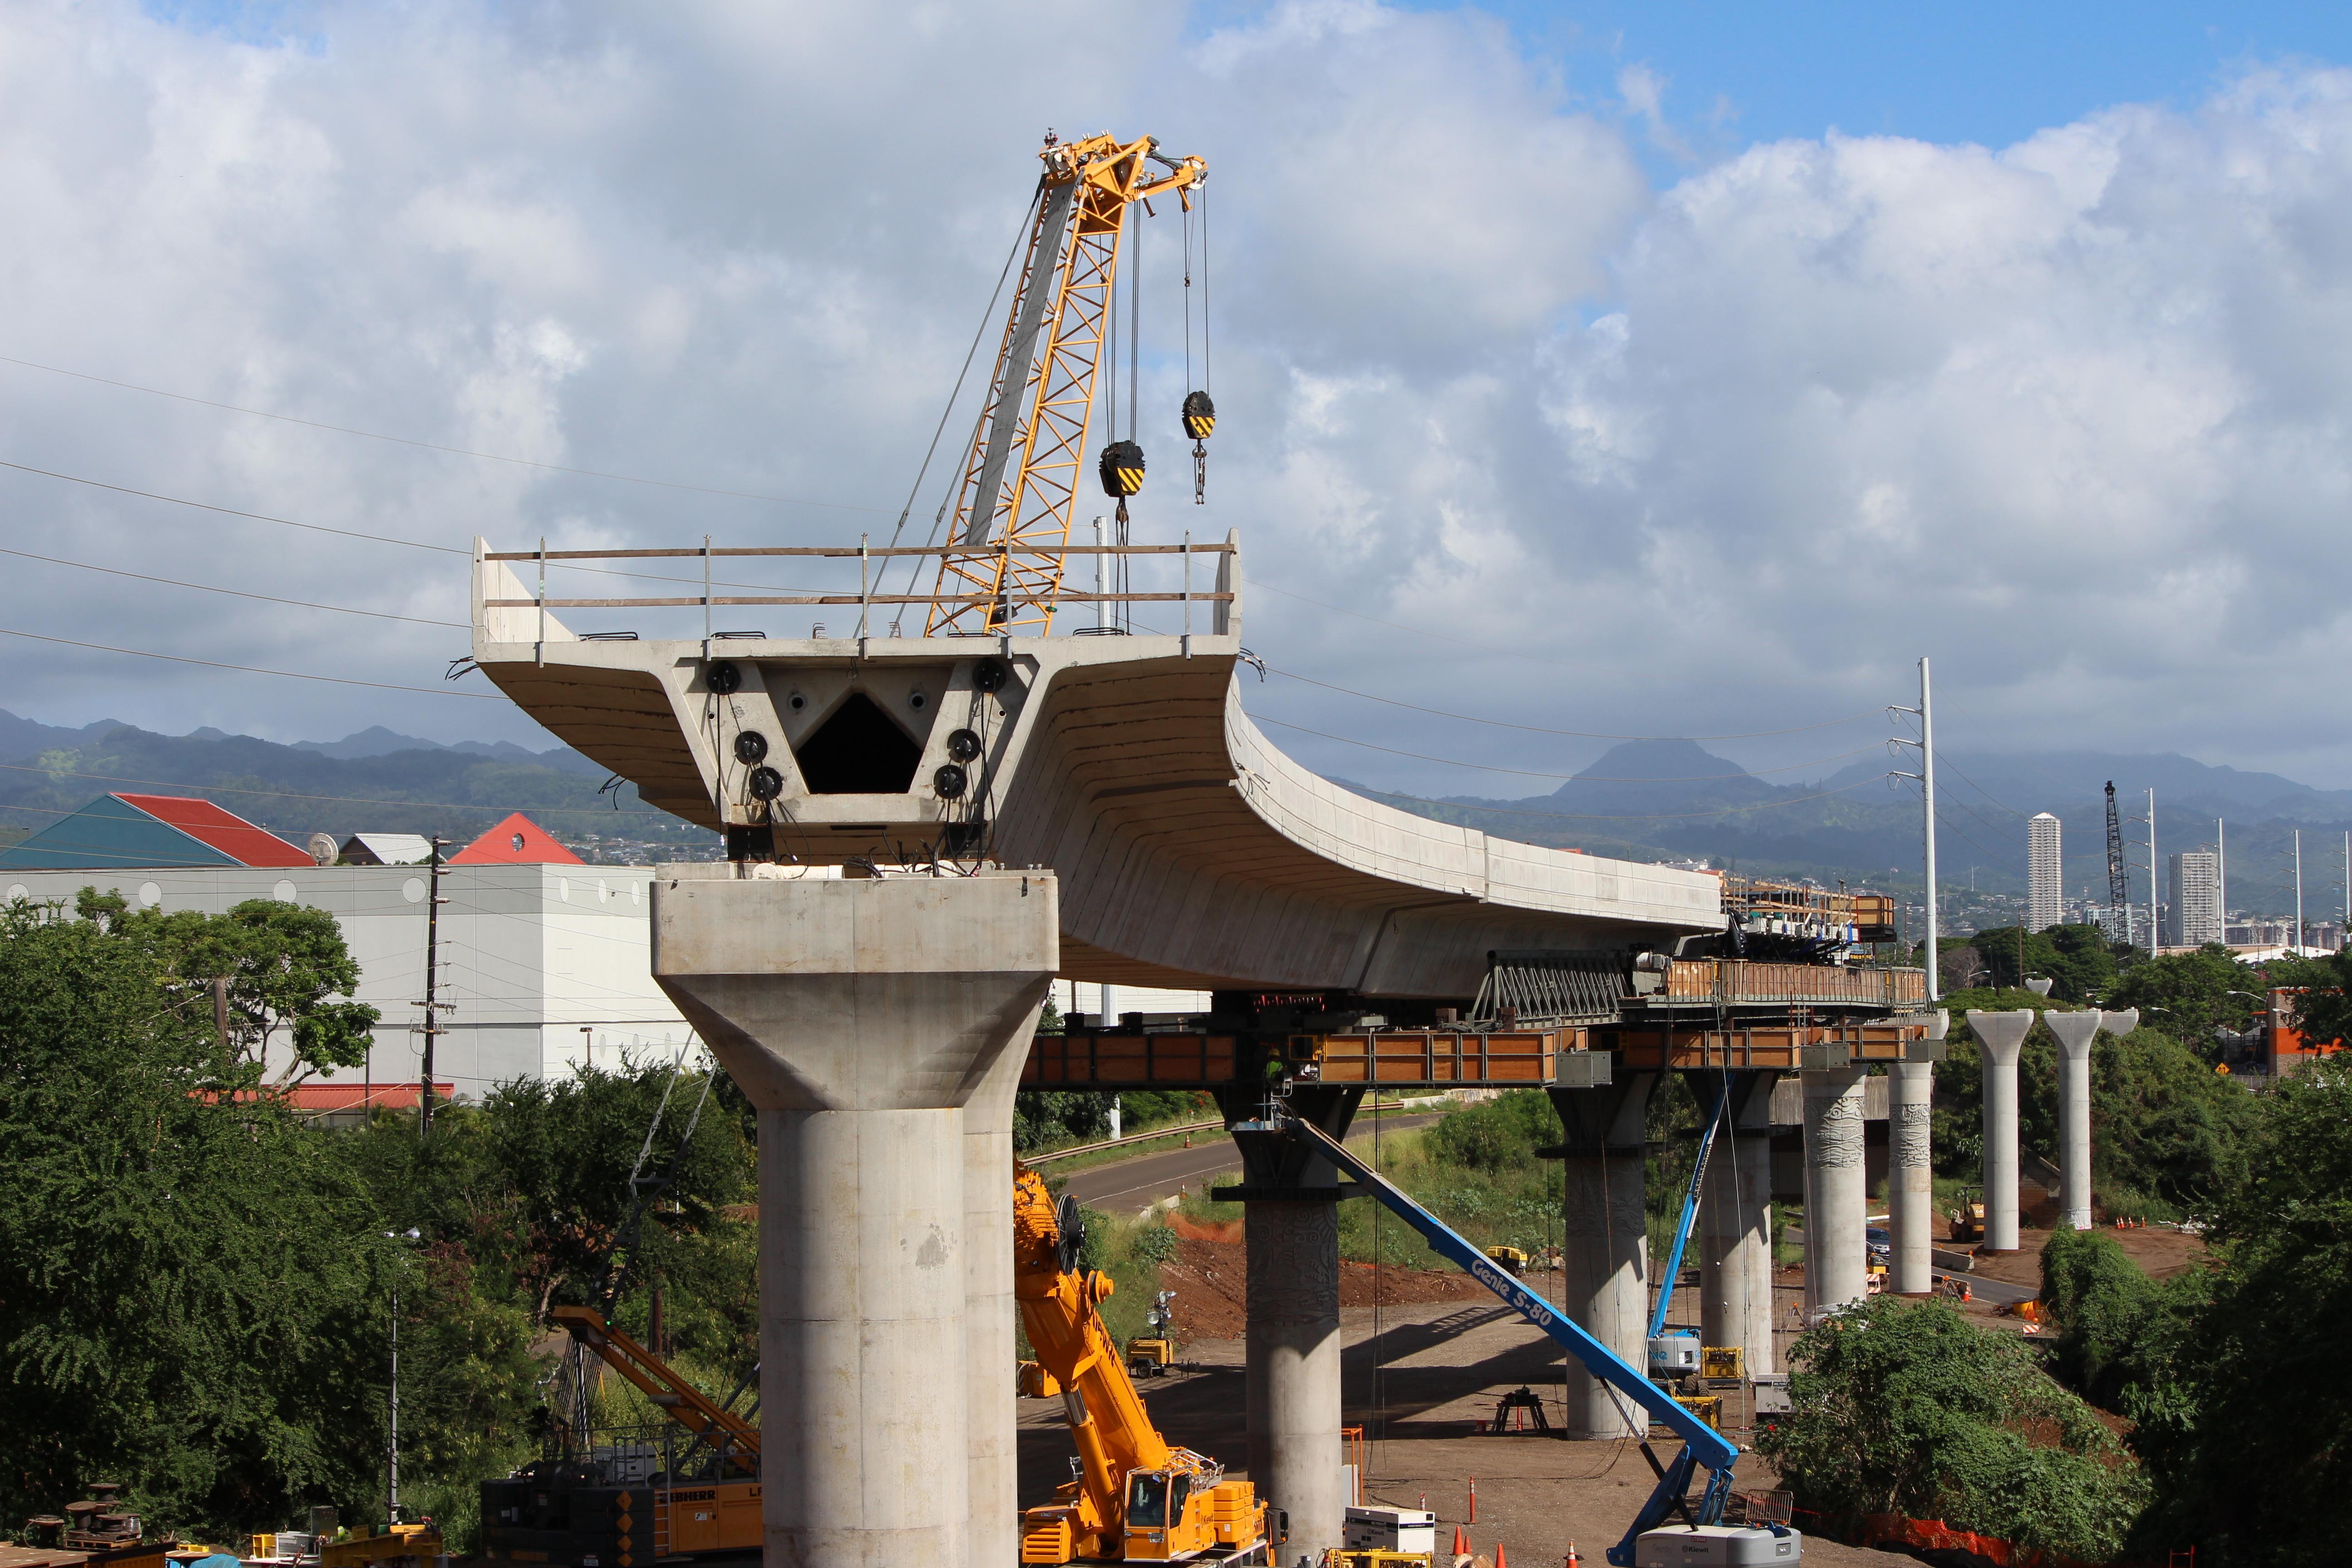 Bond funding scheme for rail shows need for audit